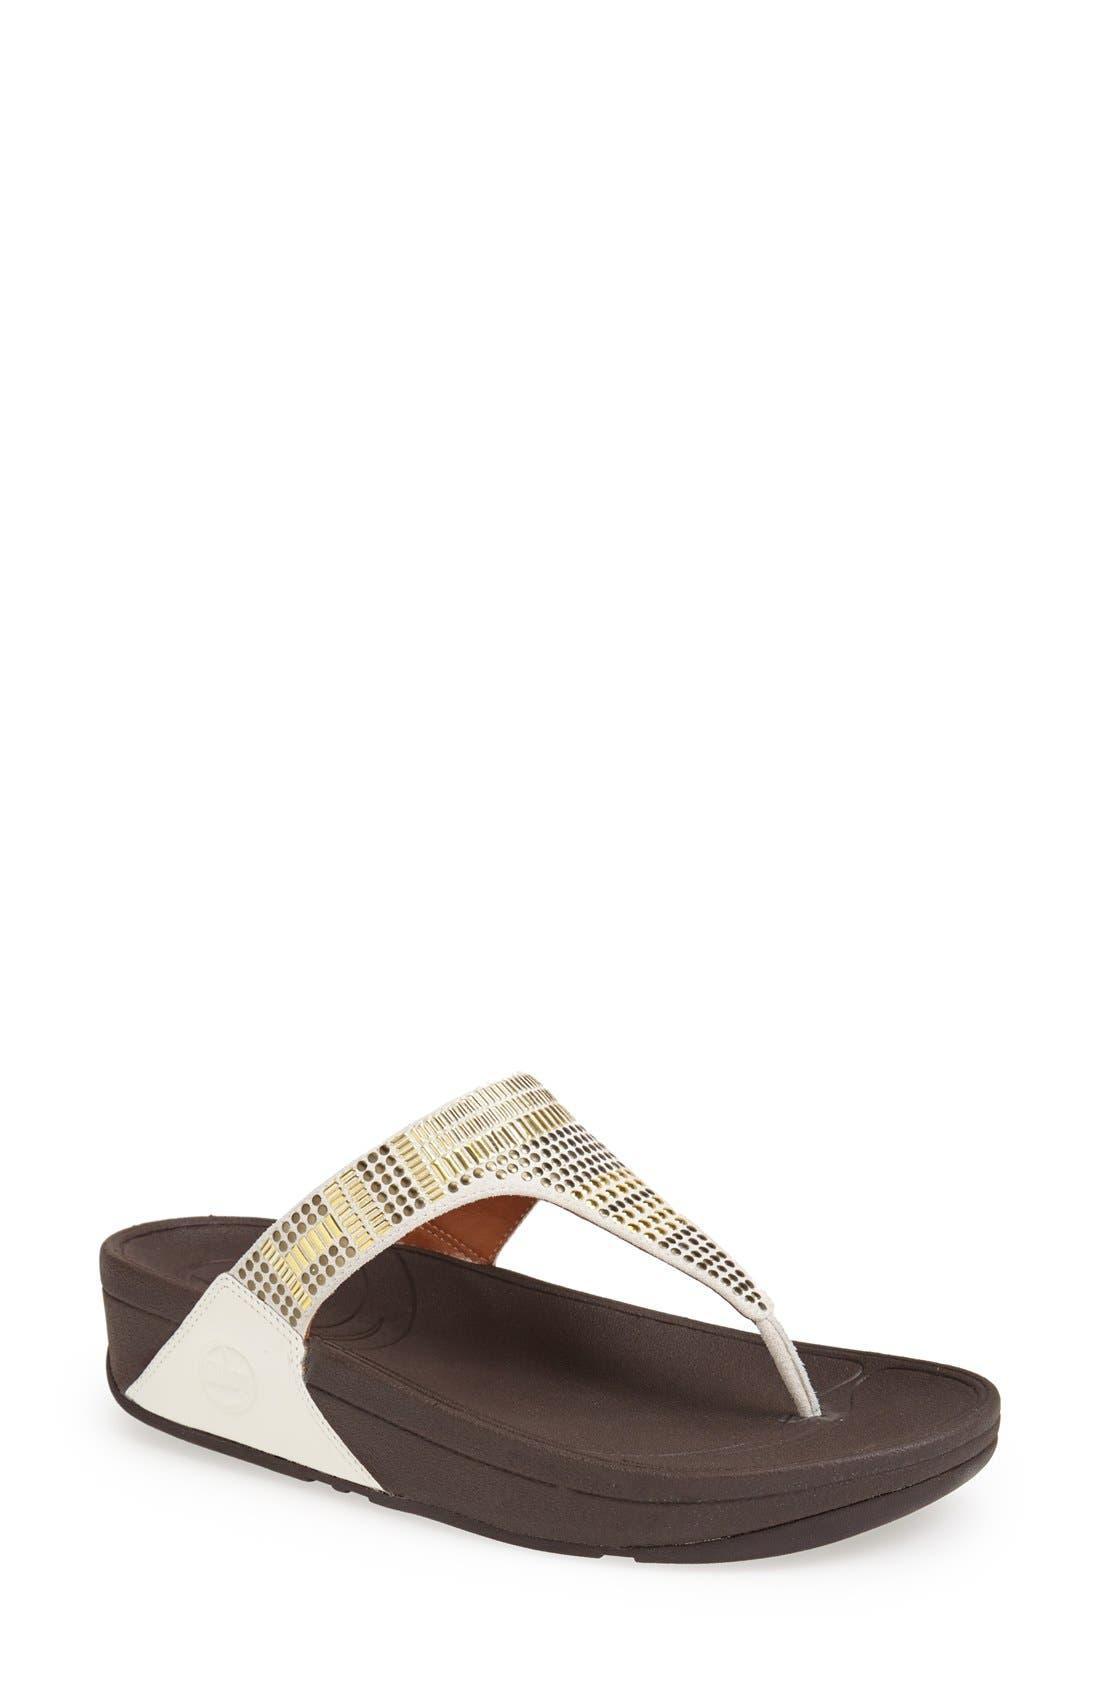 Alternate Image 1 Selected - FitFlop 'Aztek Chada' Sandal